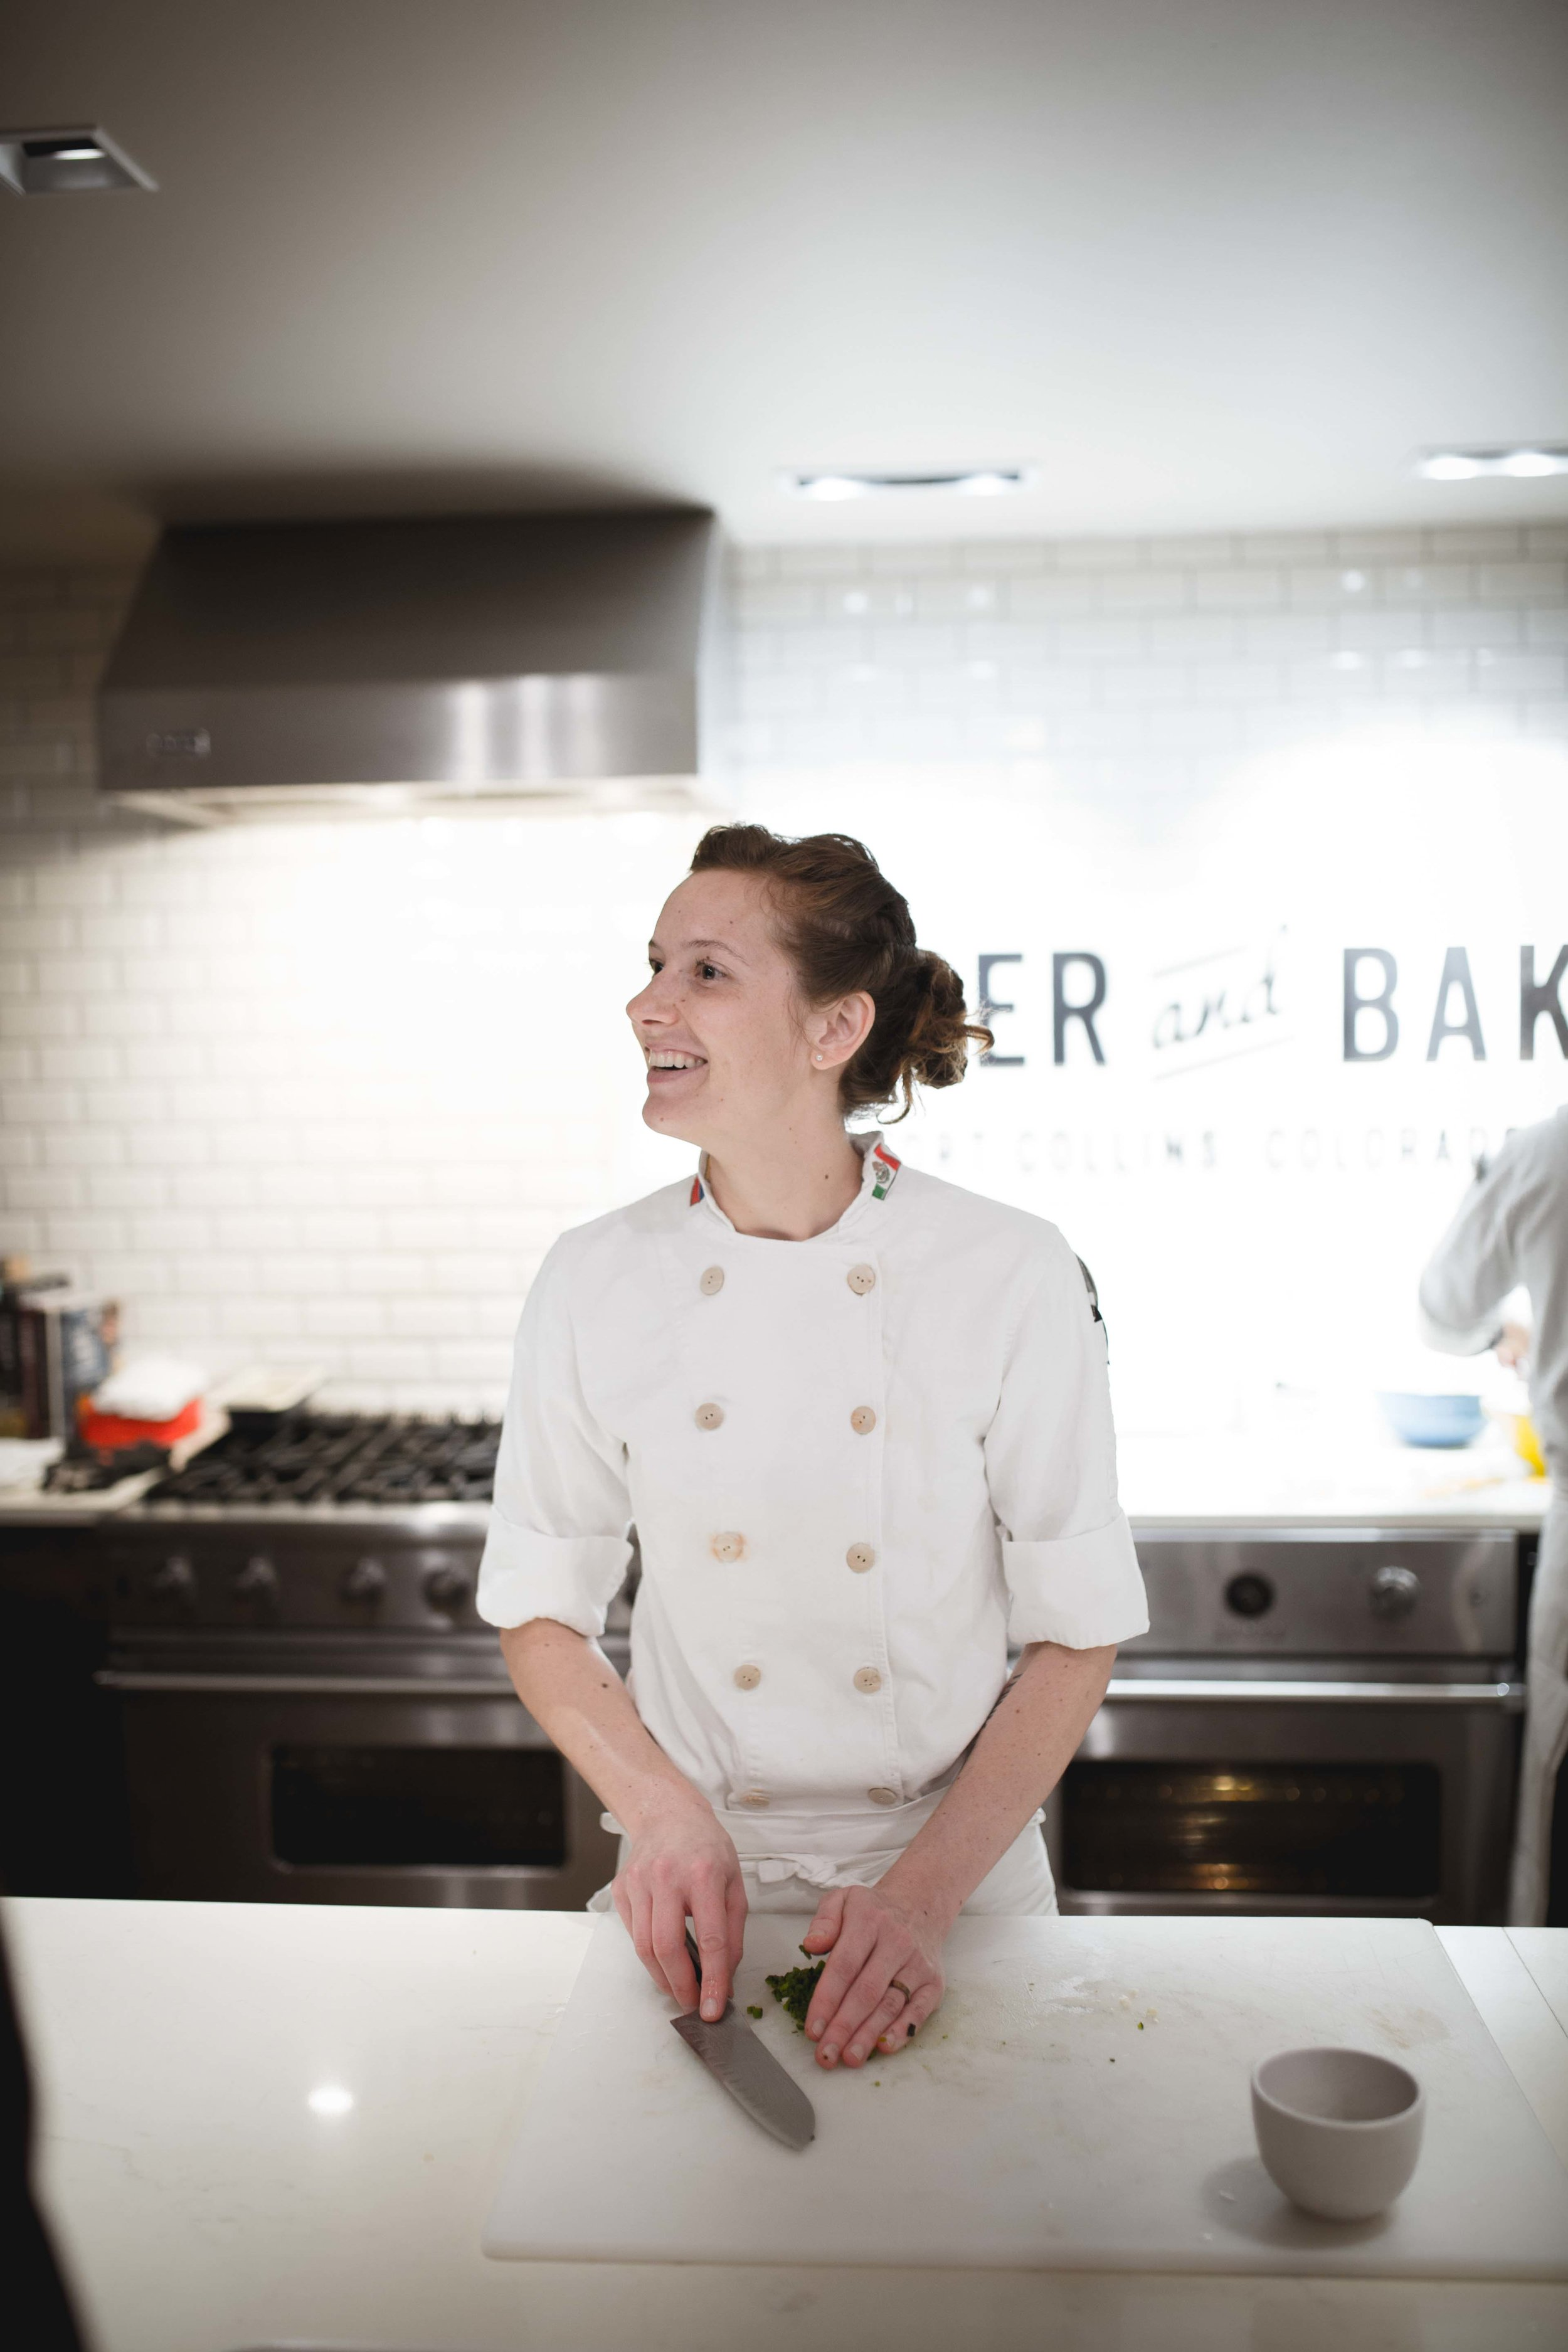 GingerandBaker-JuliyJuan-CookingClass-Feb28-19.jpg